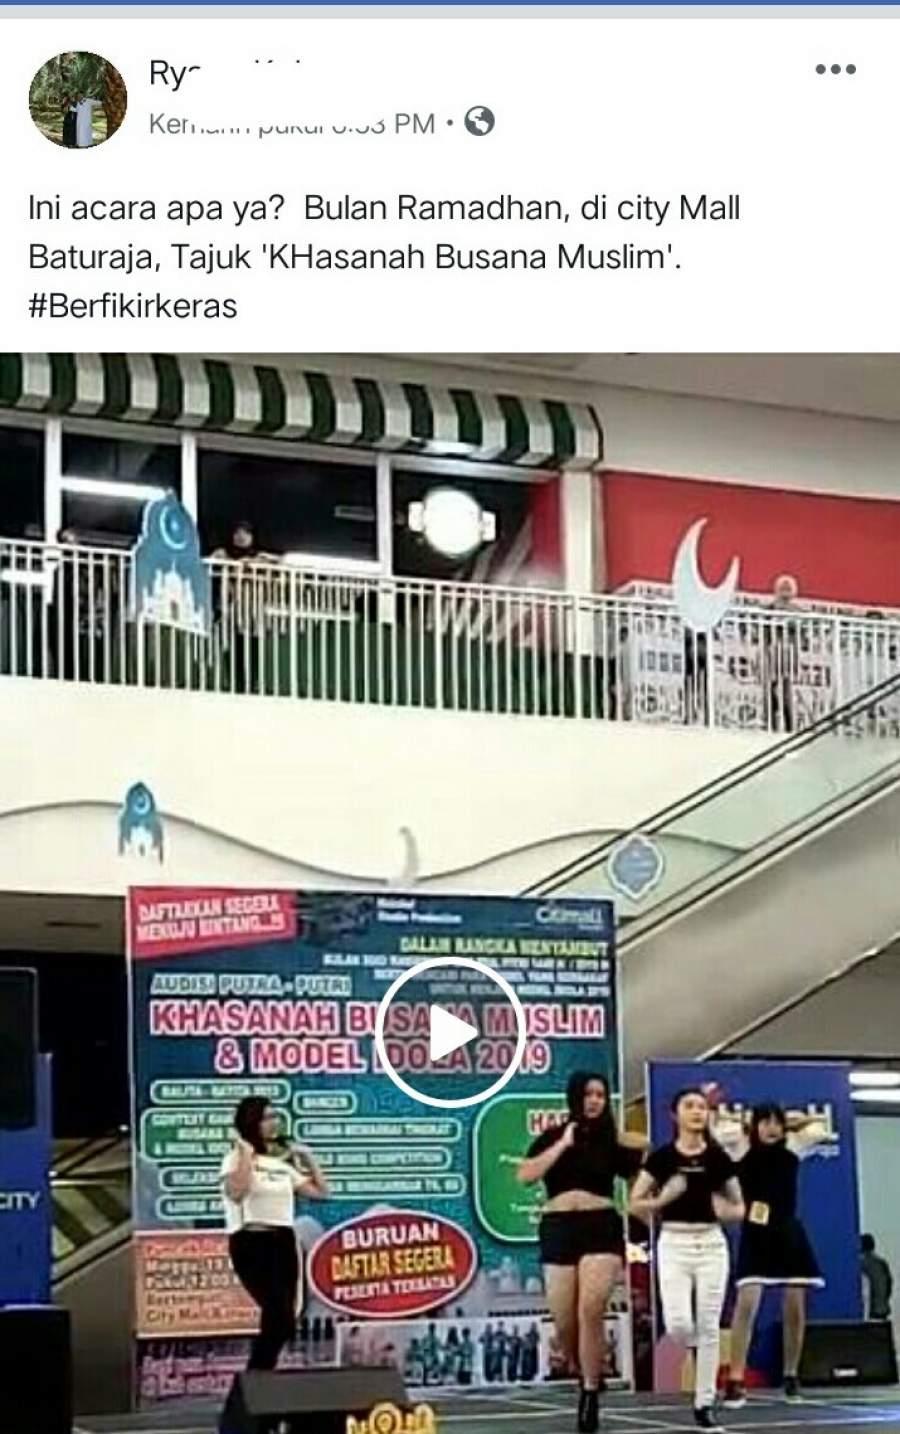 Pasca Viral Video Dancer Dalam Event Khasanah Busana Muslim dan Model Idola 2019, Begini Klarifikasi Pihak Eo Dan manajemen Citimall